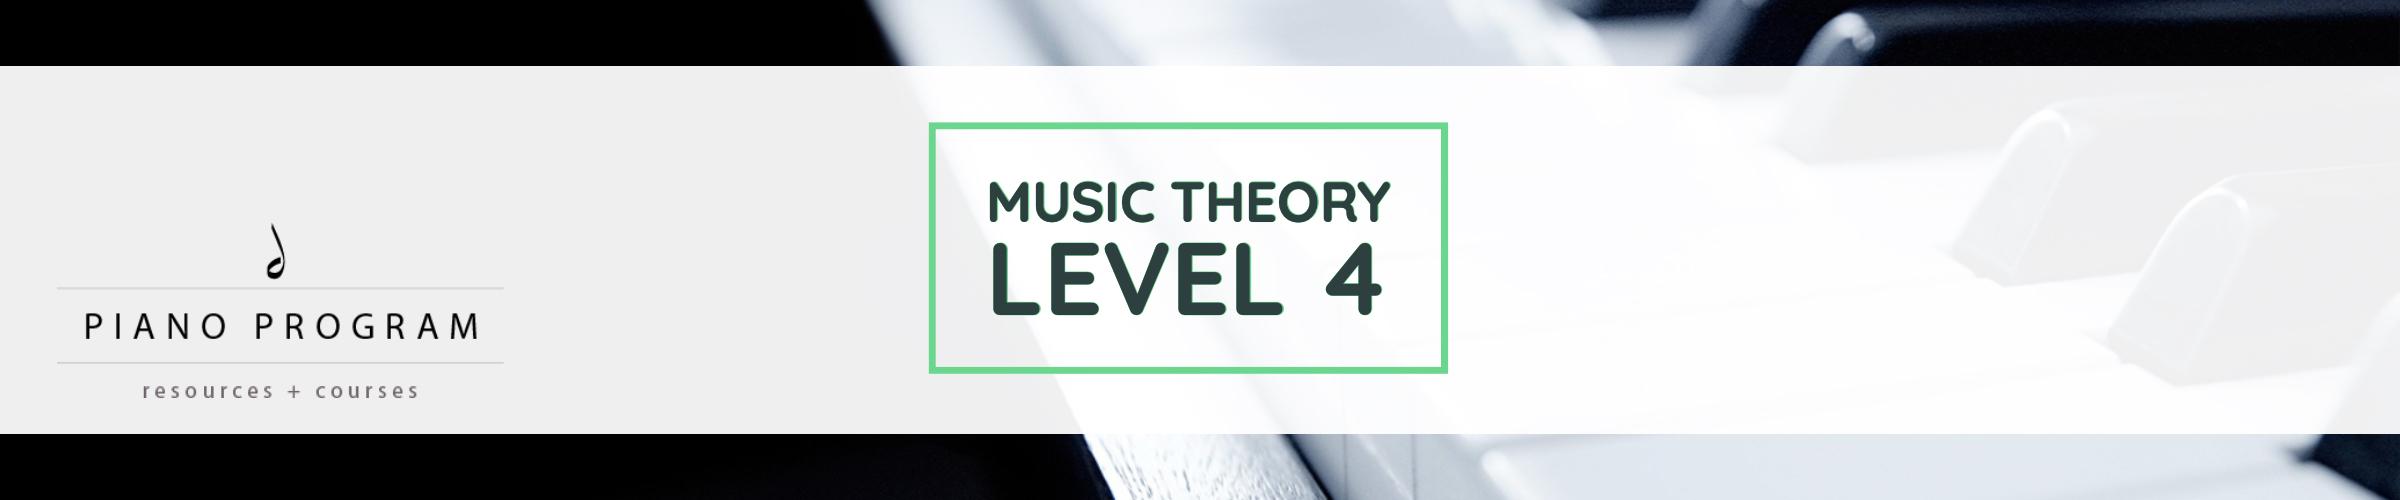 Cover pianoprogramtheory4